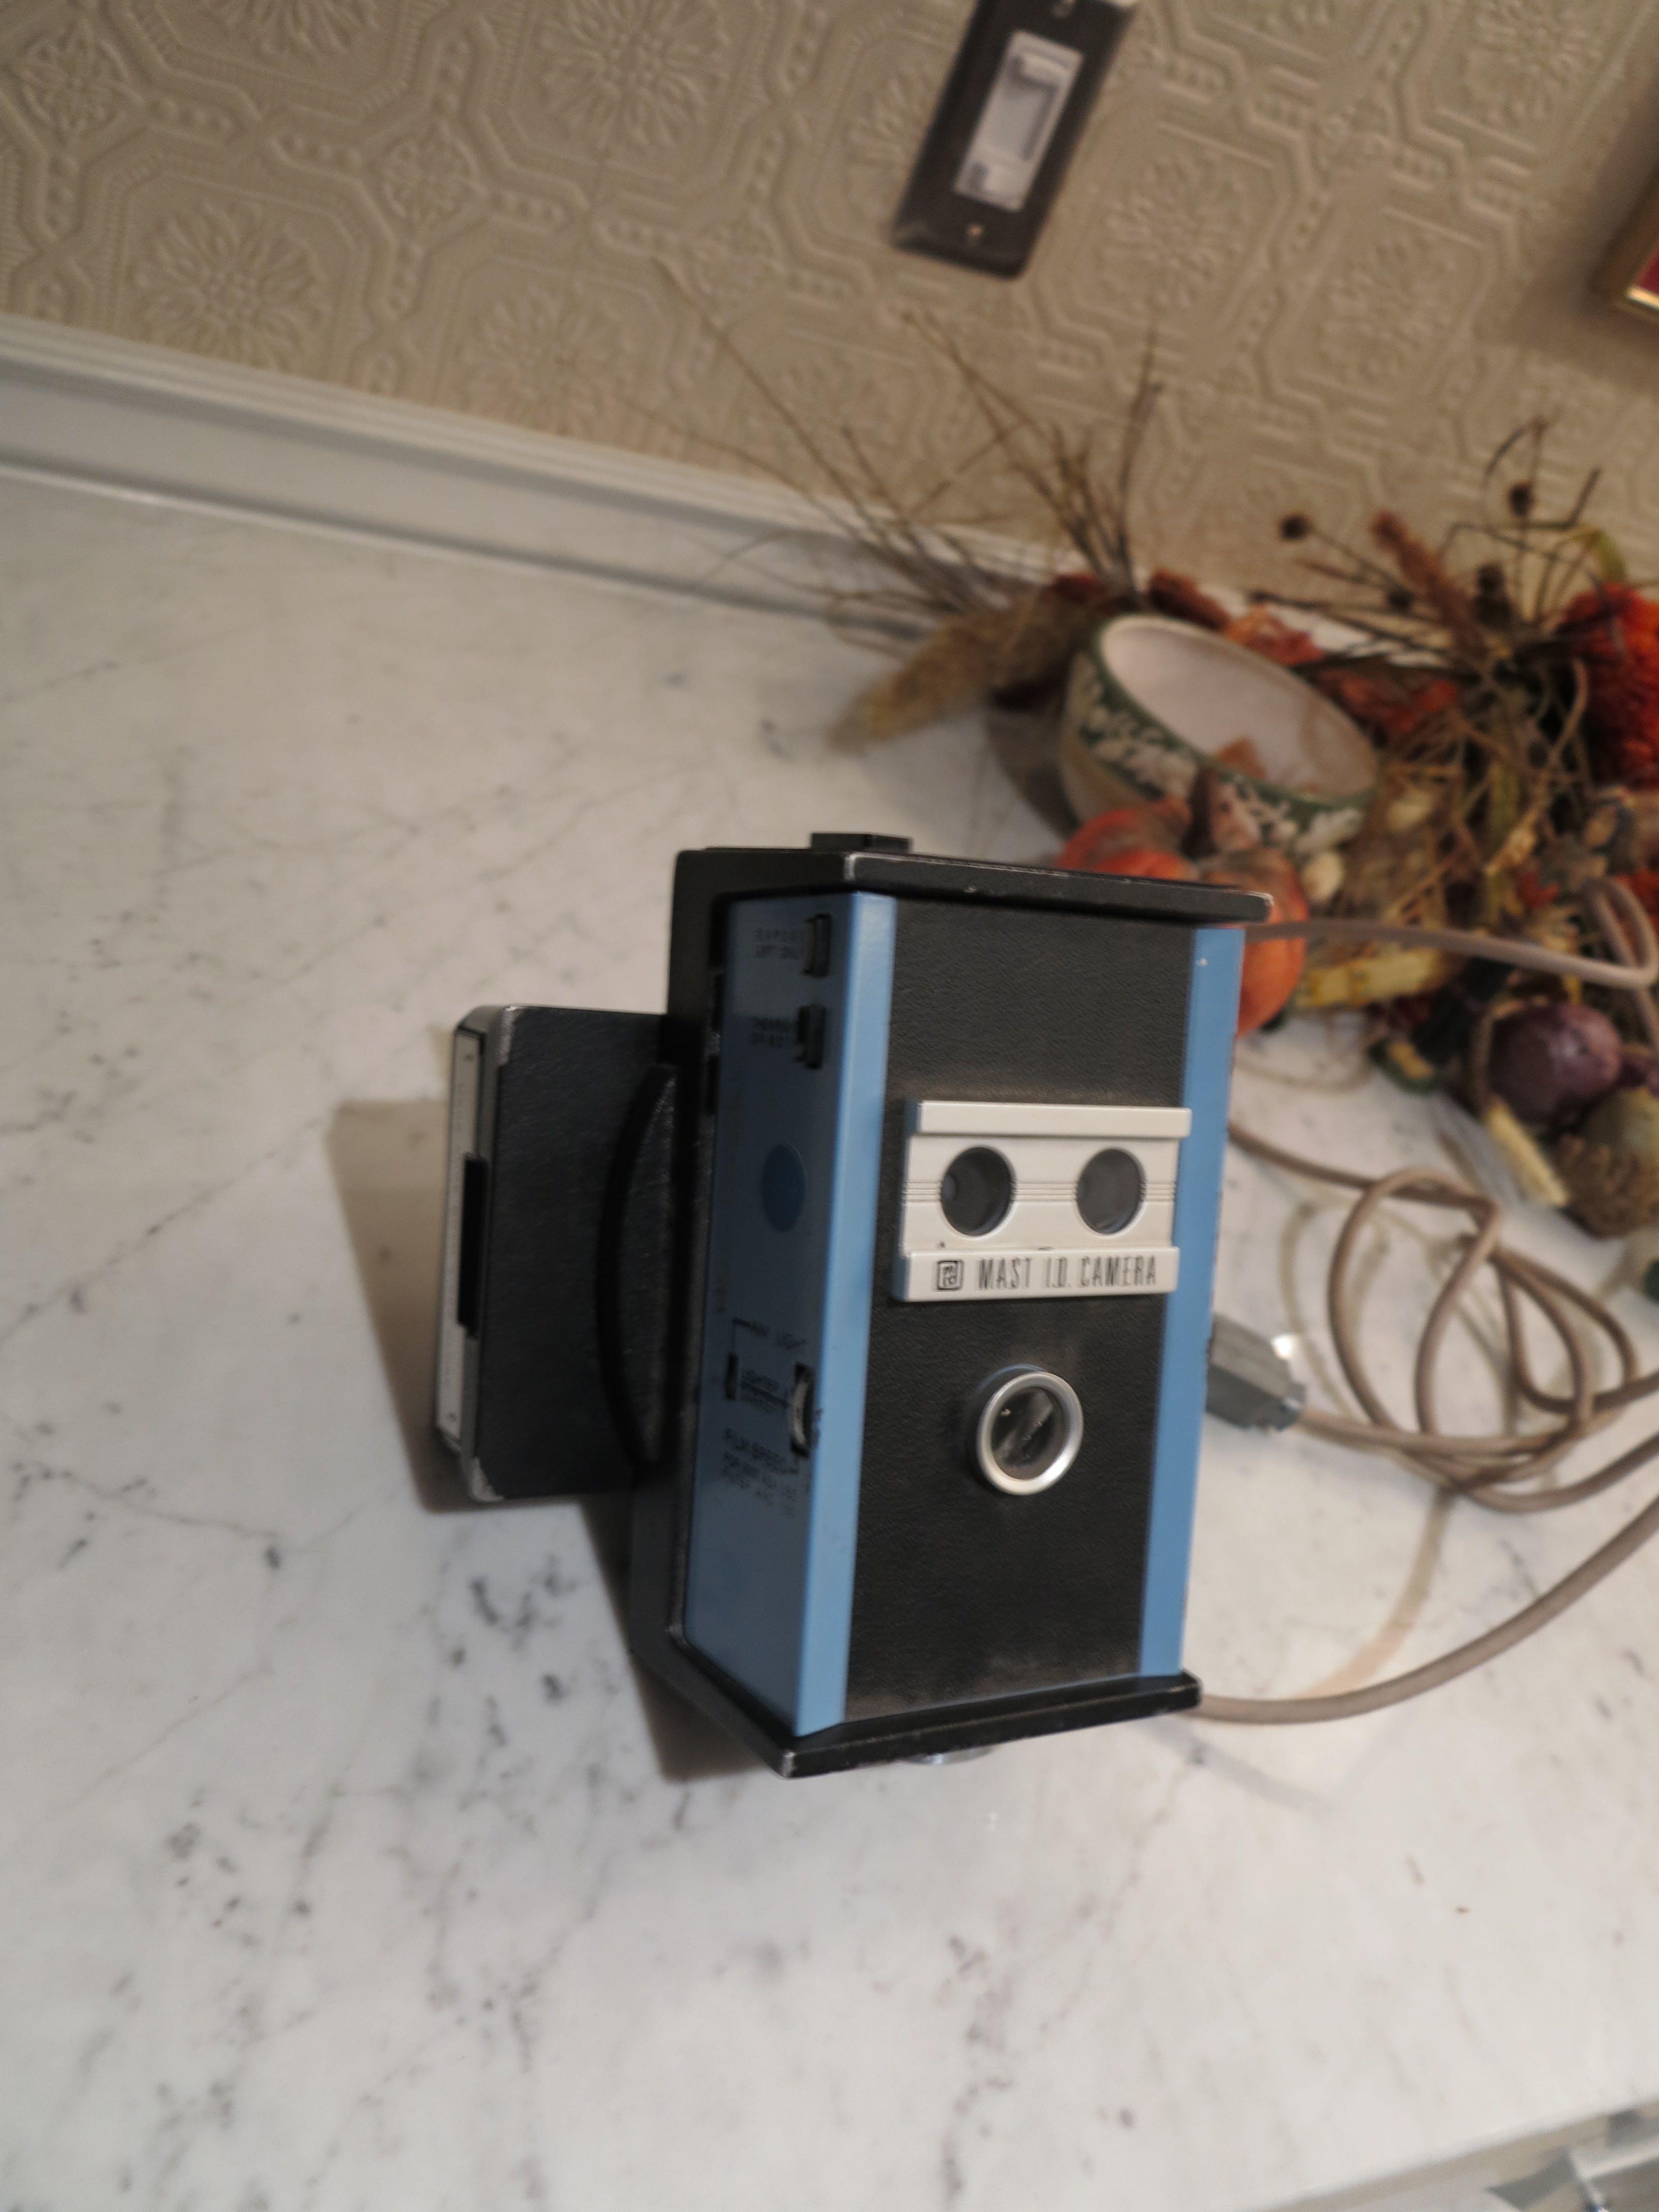 Mast ID camera06.jpg